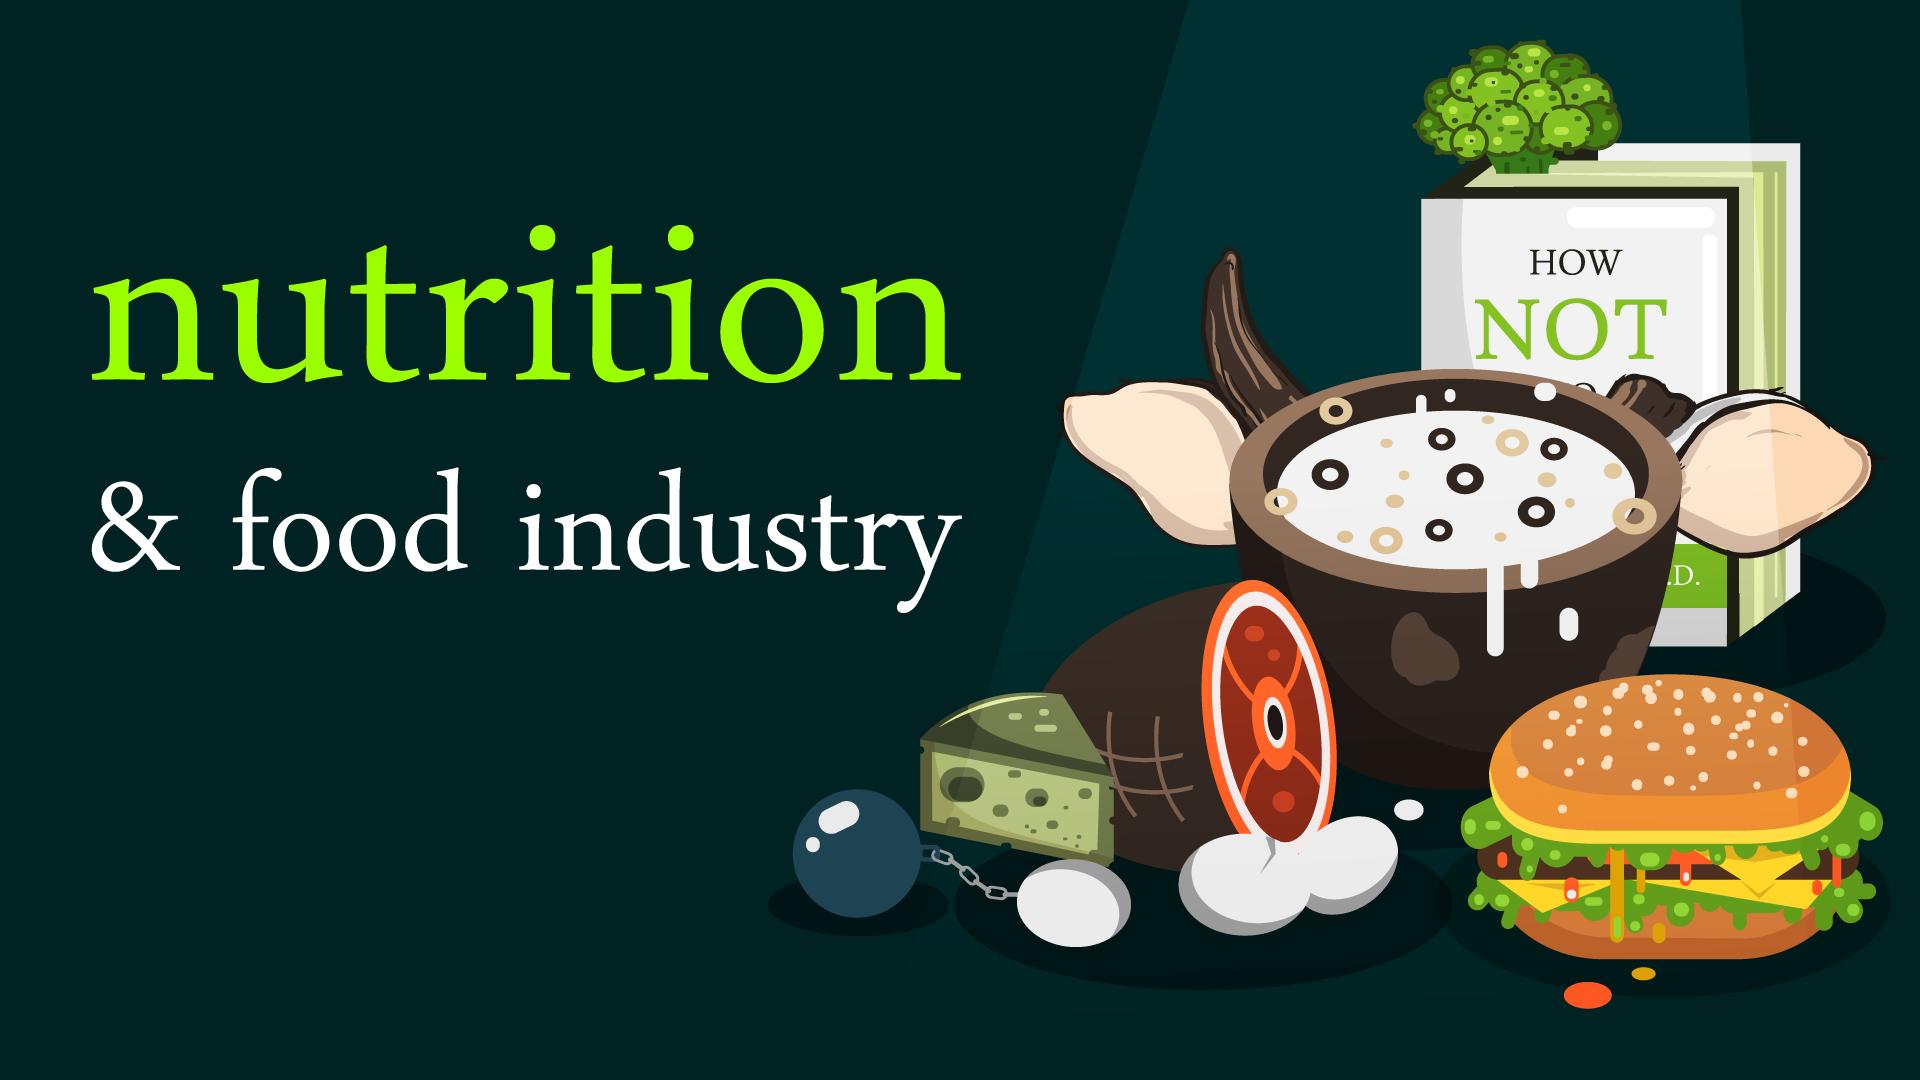 utrition & food industry